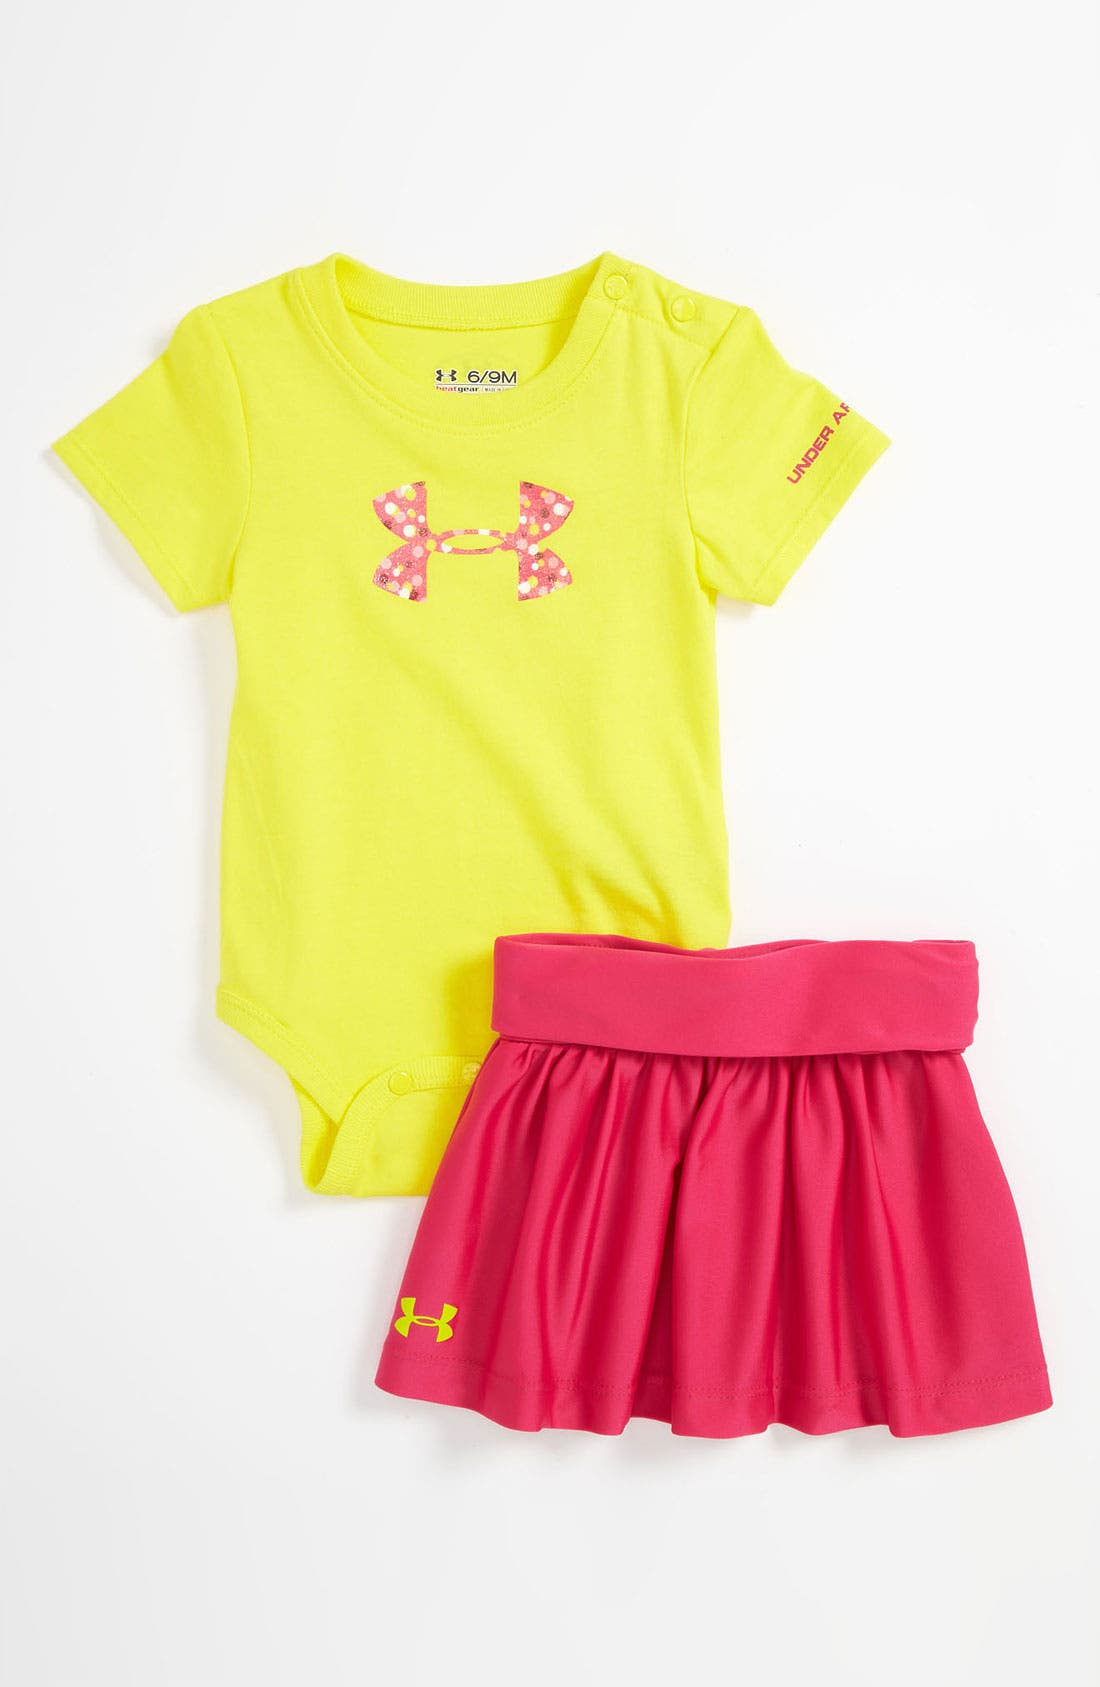 Main Image - Under Armour Bodysuit & Skirt (Infant)